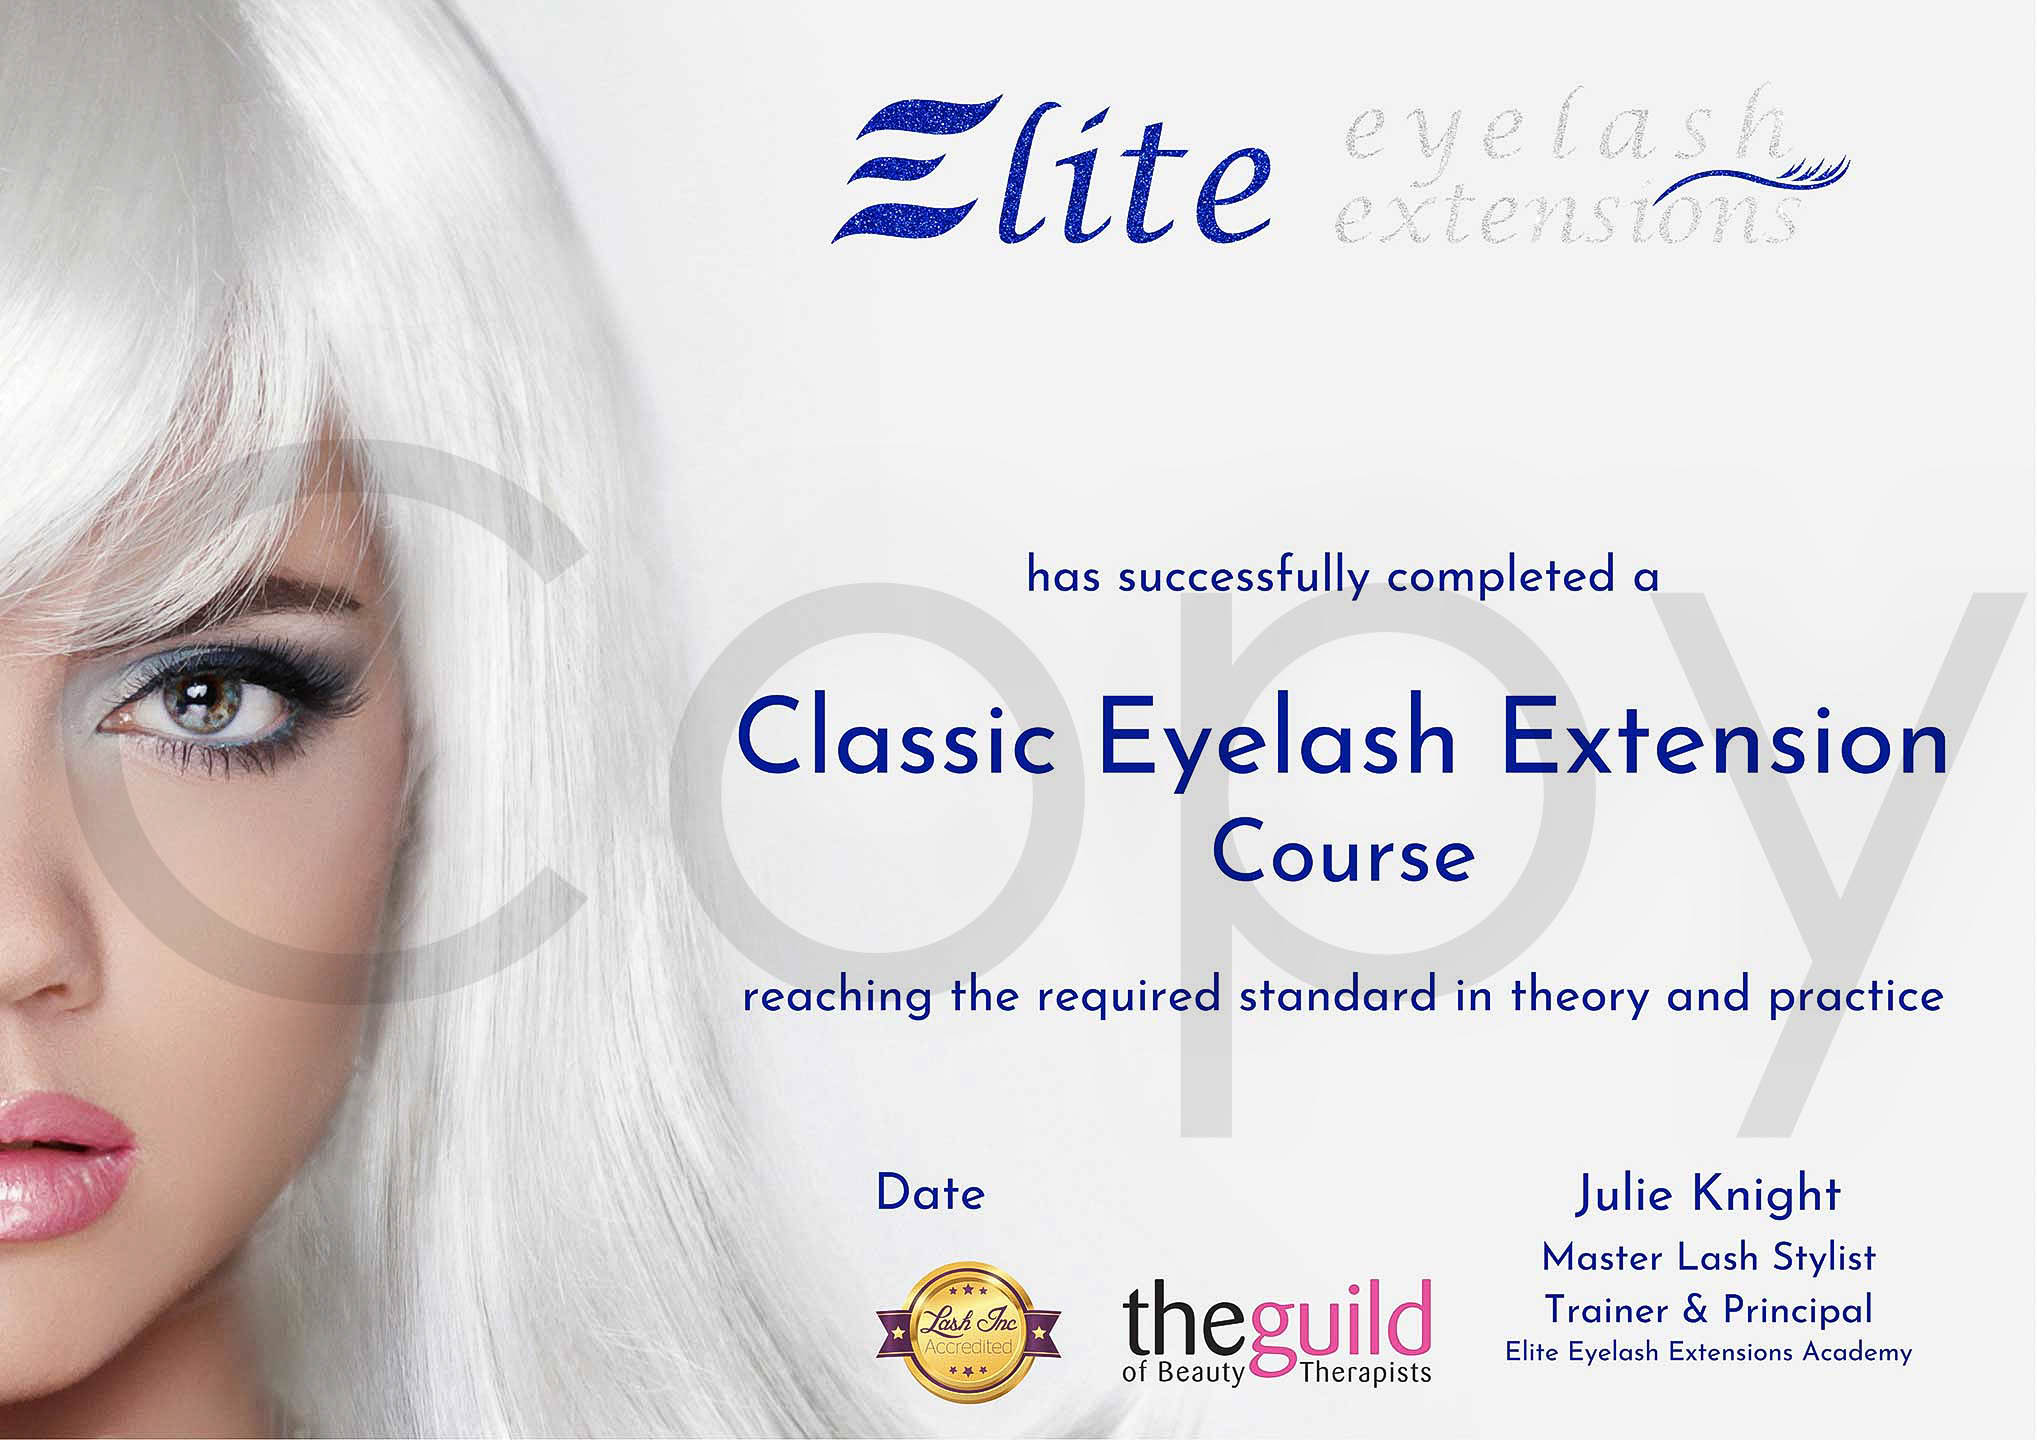 Elite-Eyelash-Extensions-Training-Certificate-1